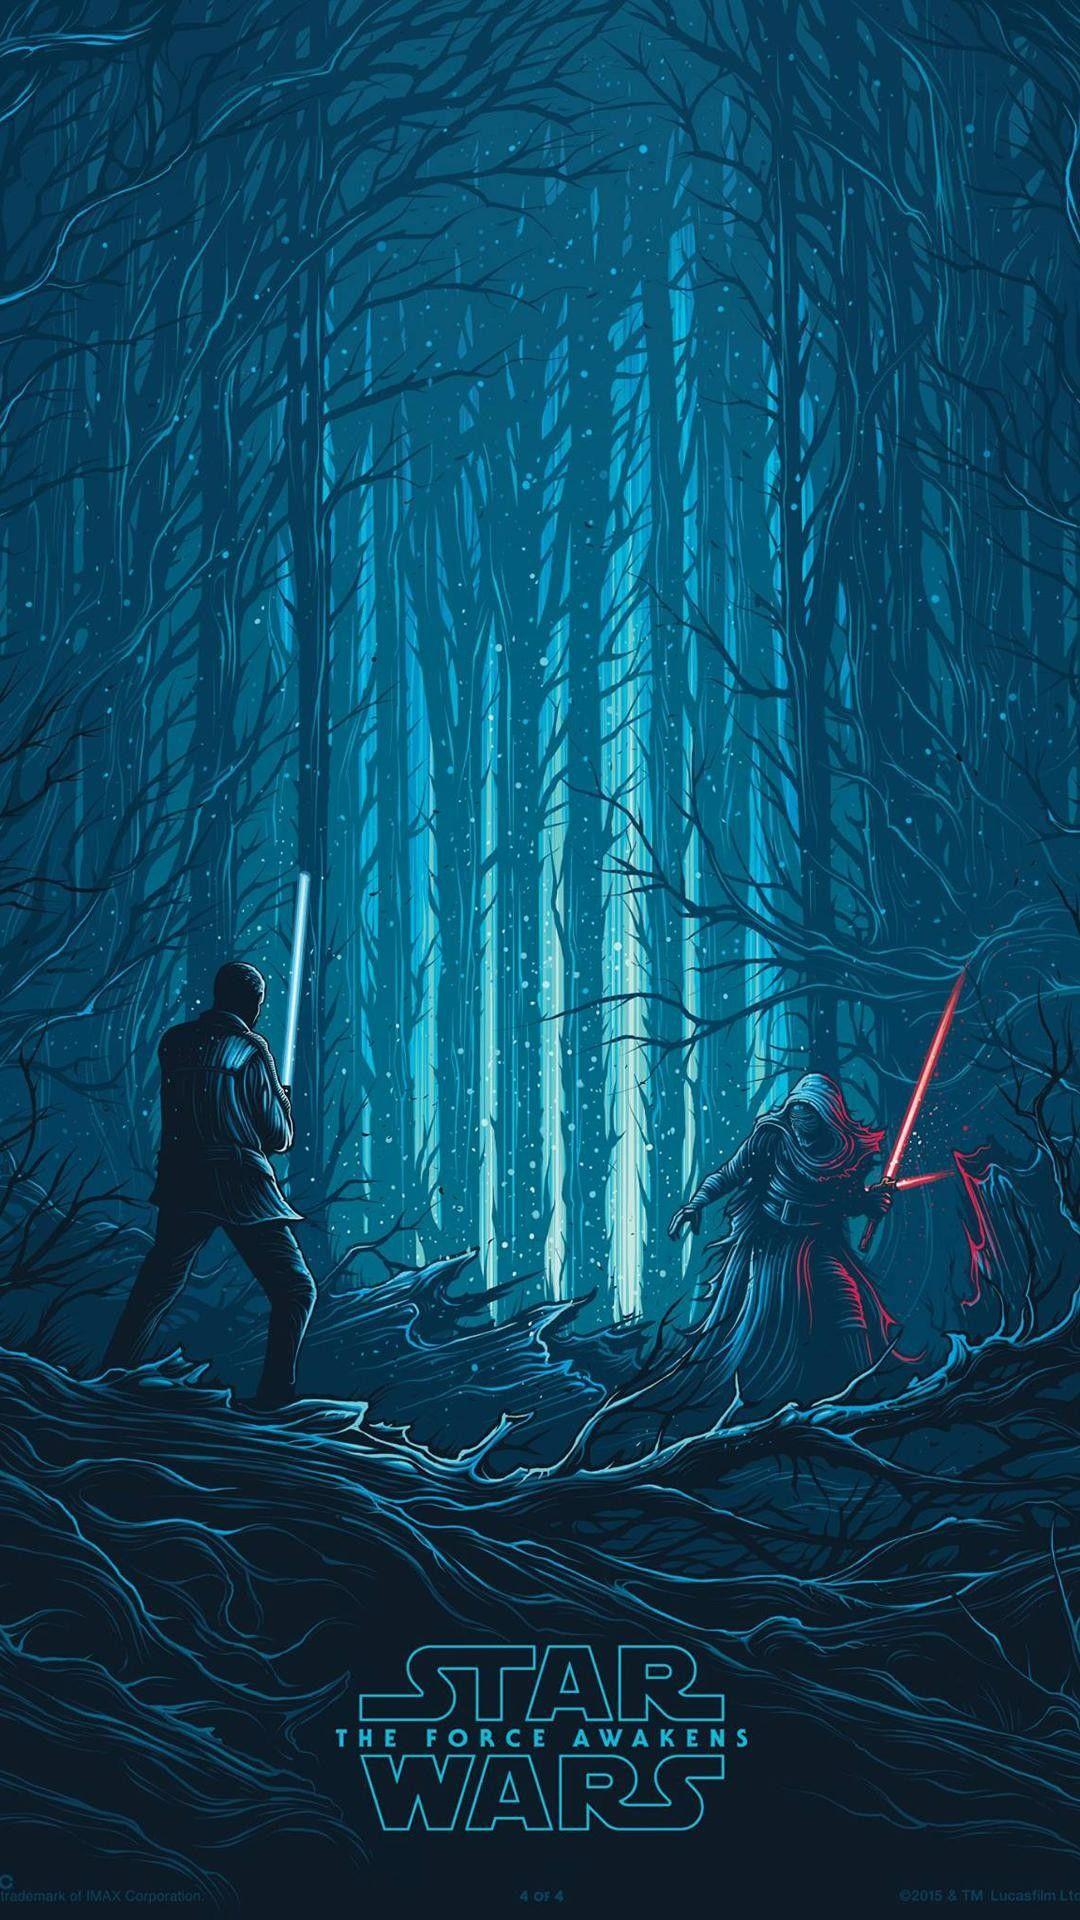 Star Wars Iphone Wallpaper Hd 84 Images Star Wars Wallpaper Star Wars Art Star Wars Background